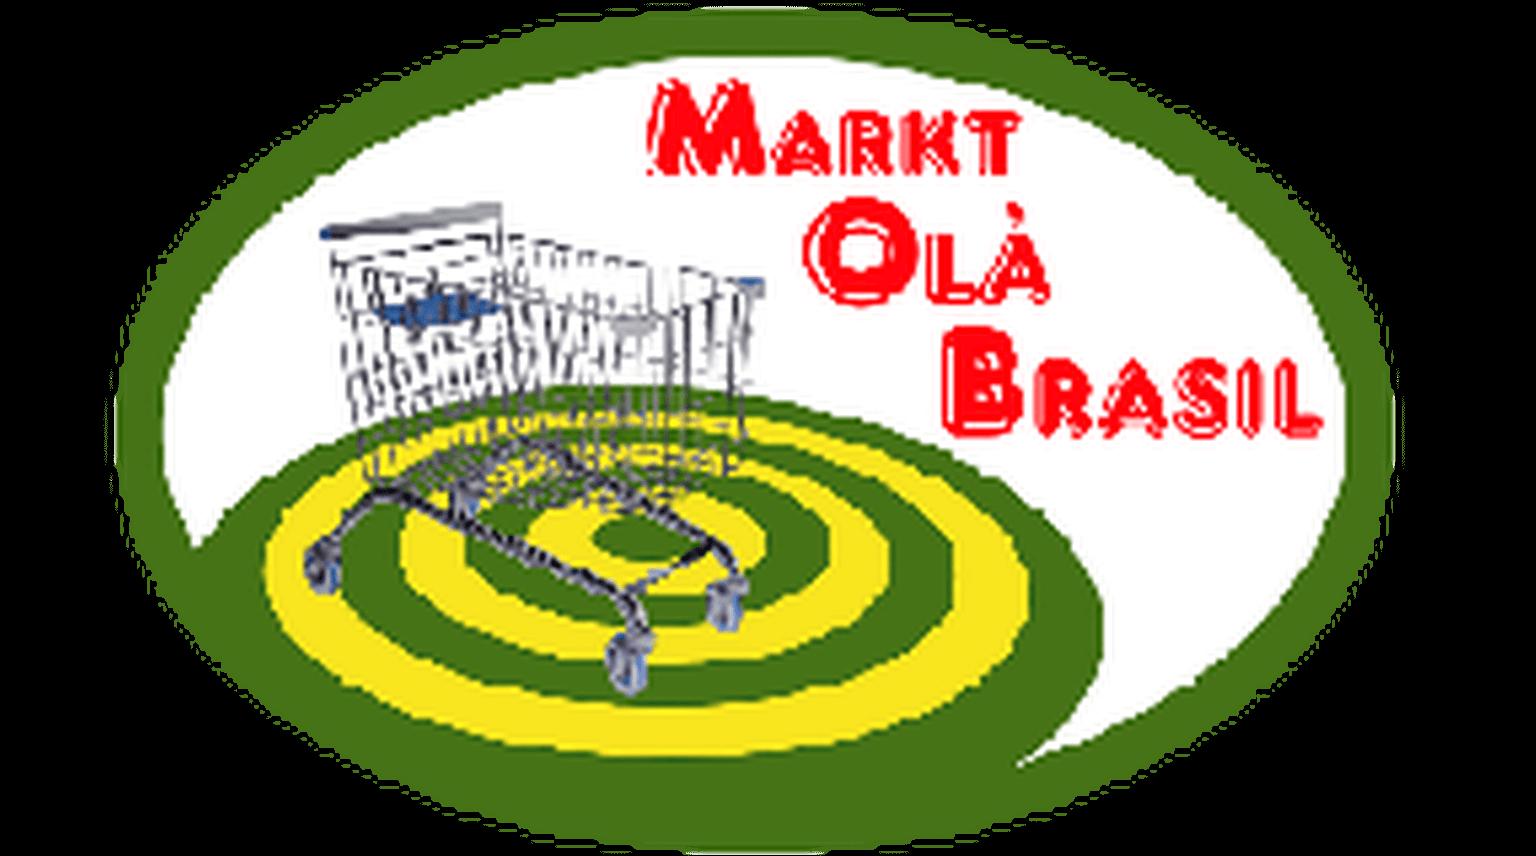 Ola Brasil-supermercado (Cópia)